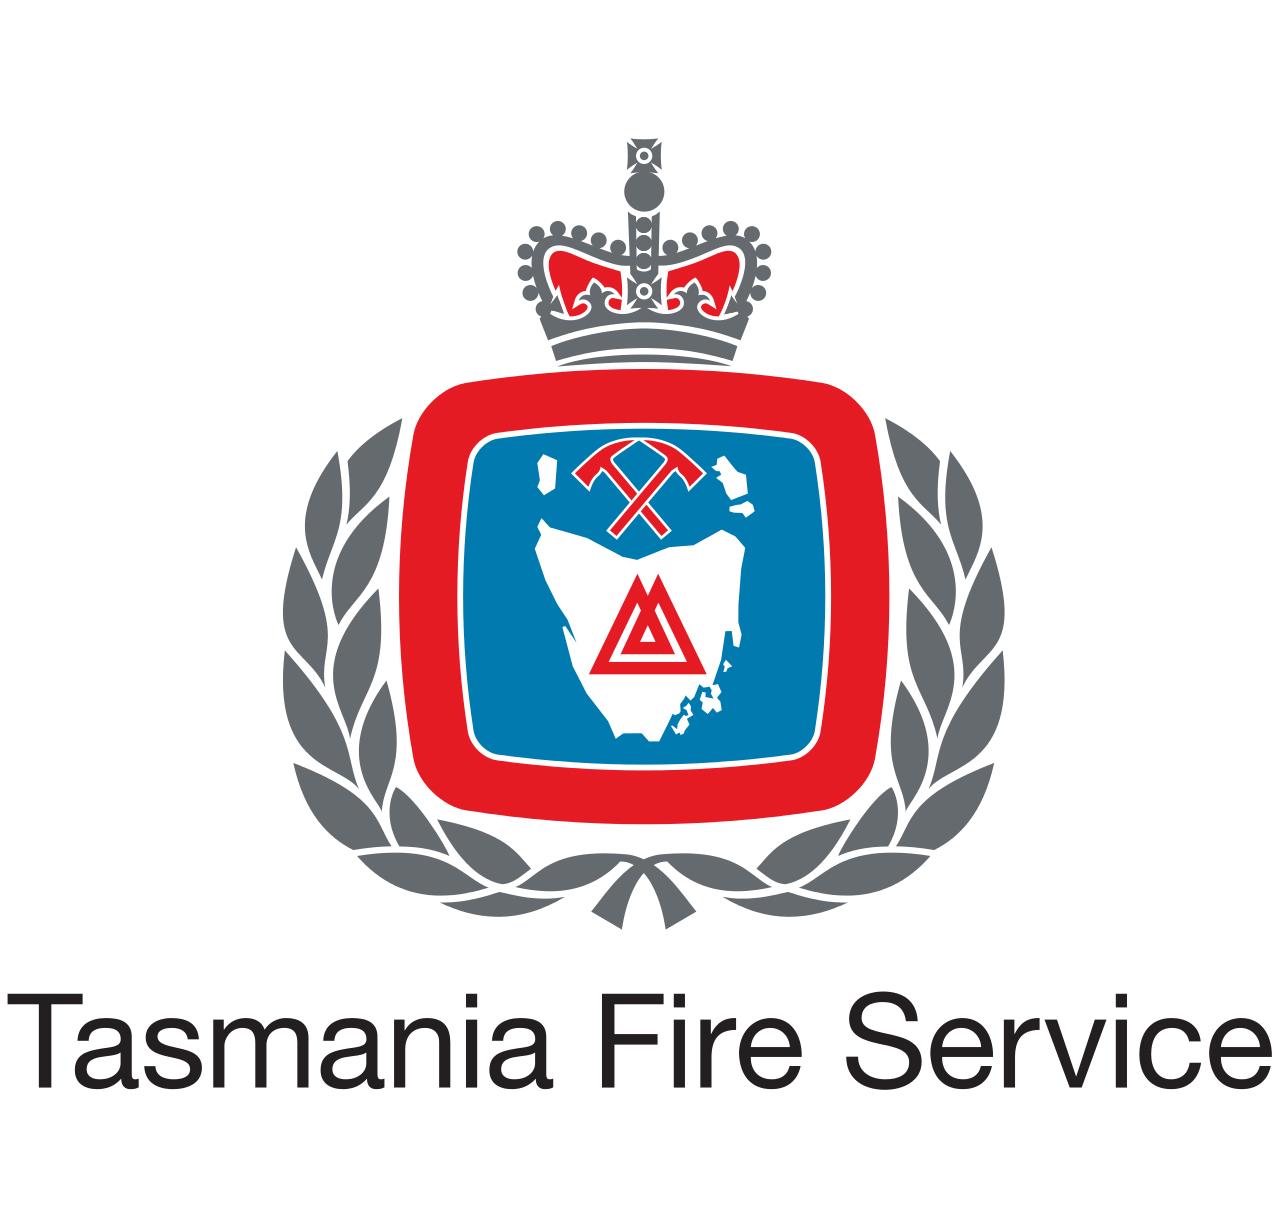 Tasmania_Fire_Service_Logo.png